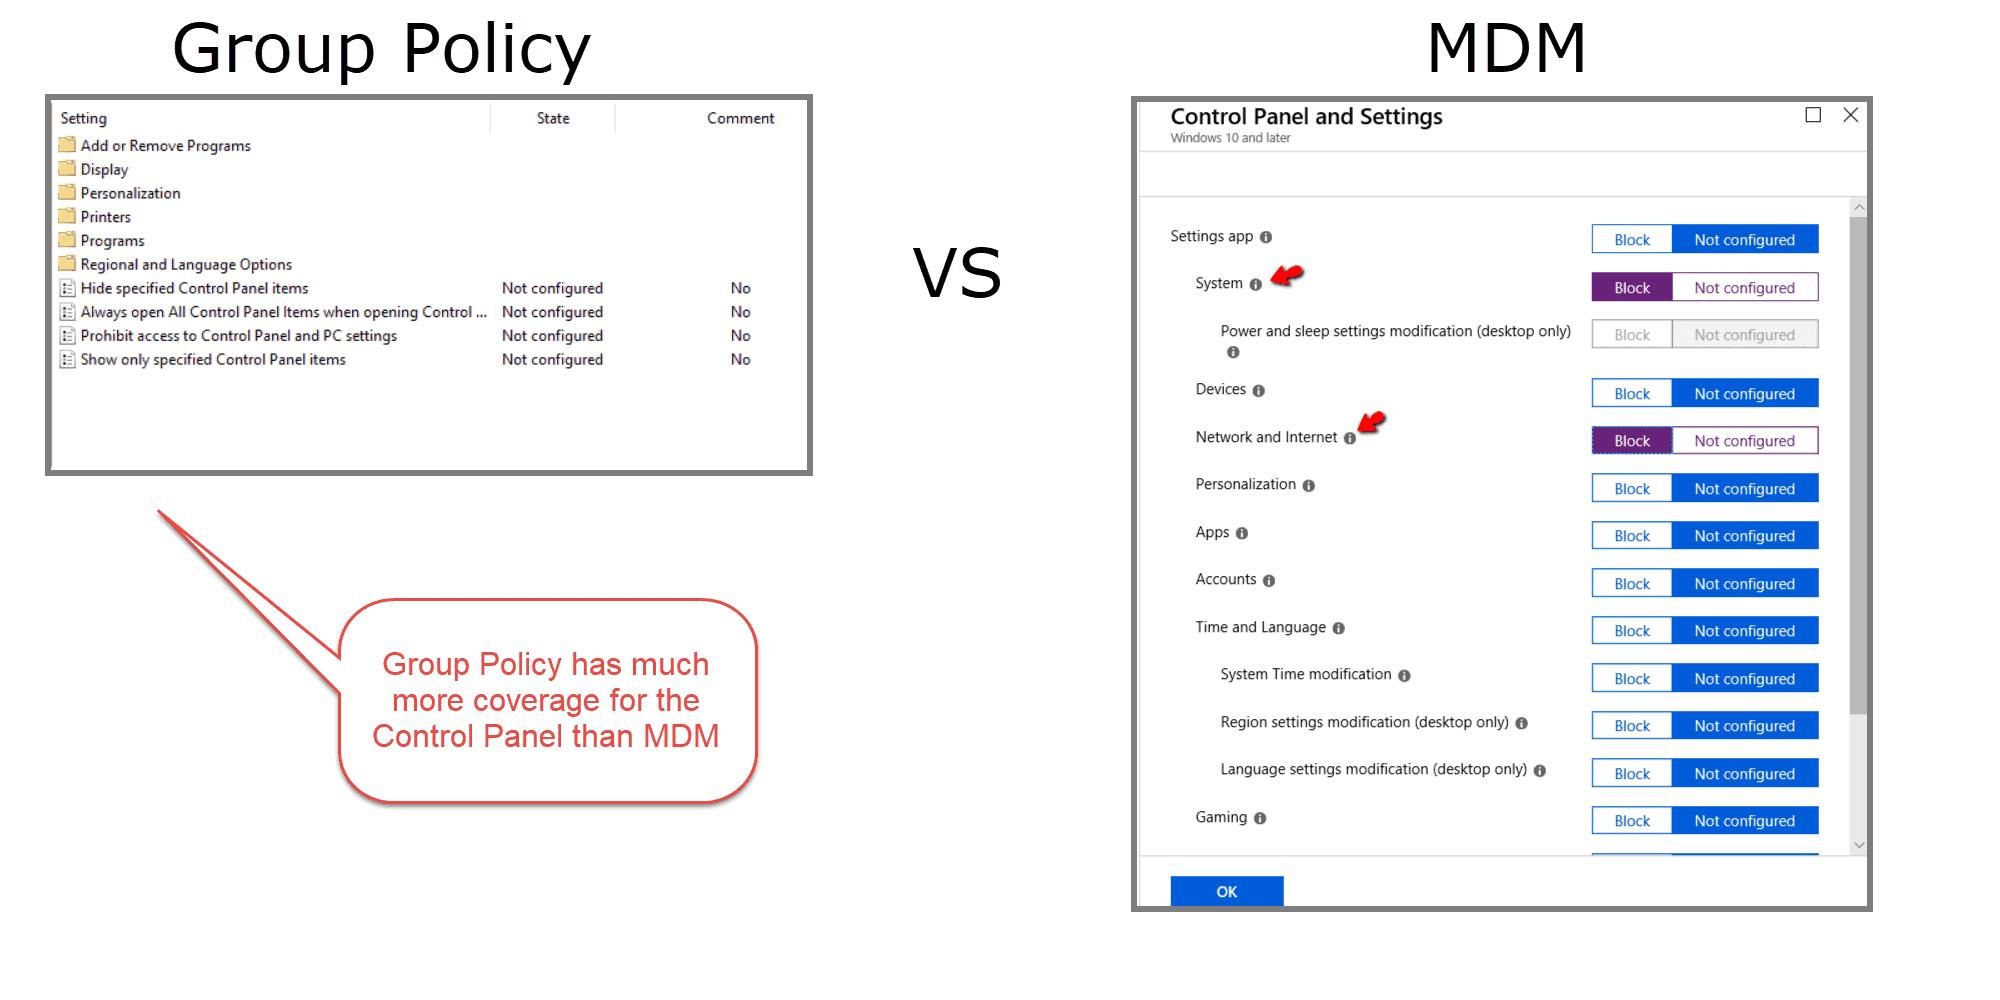 Windows 10 MDM Control Panel Group Policy